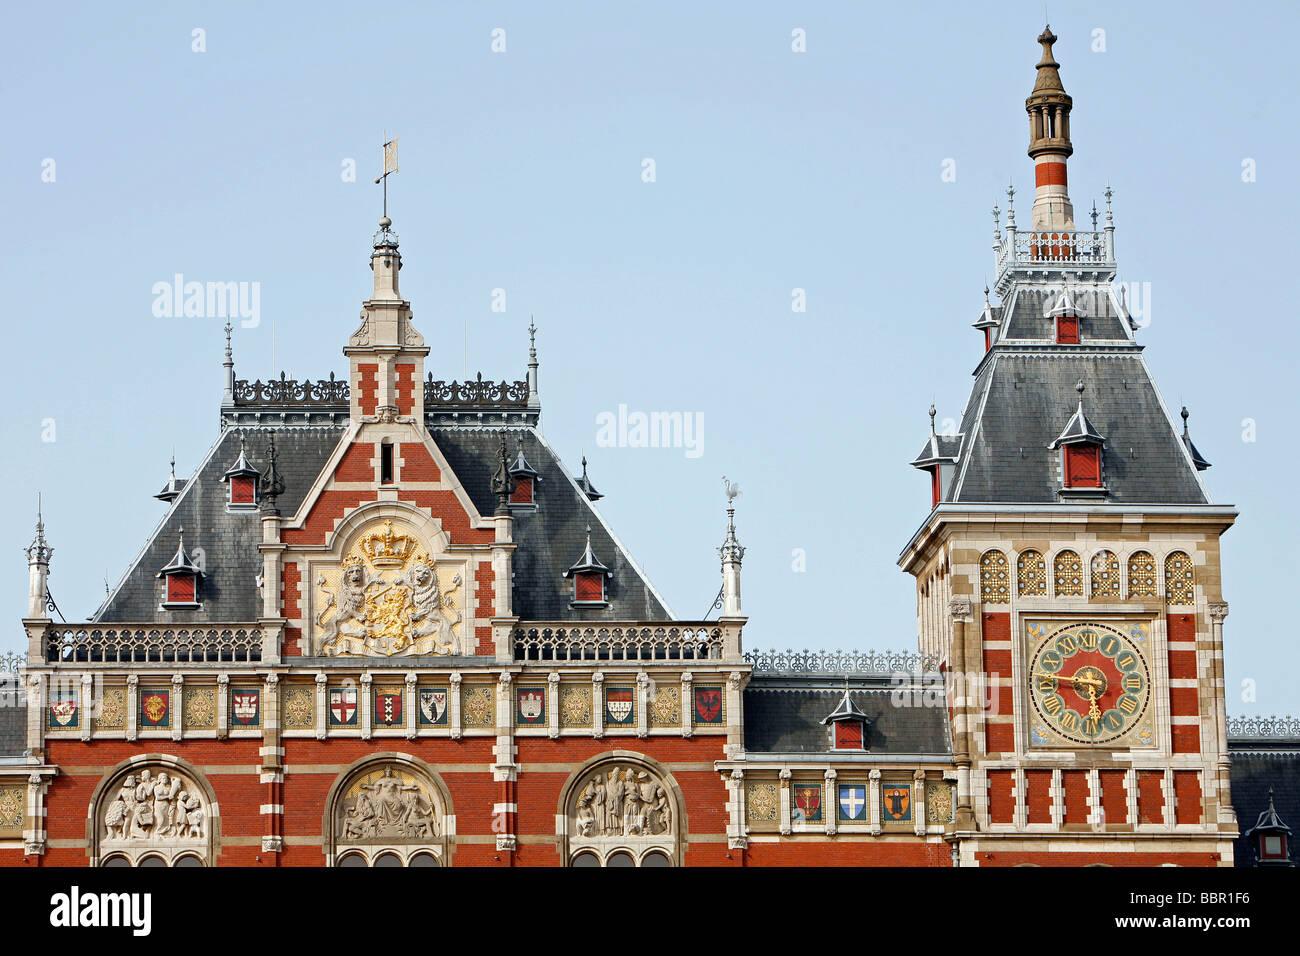 DUTCH RENAISSANCE STYLE FACADE, CENTRAAL STATION, MAIN TRAIN STATION, AMSTERDAM, NETHERLANDS, HOLLAND - Stock Image